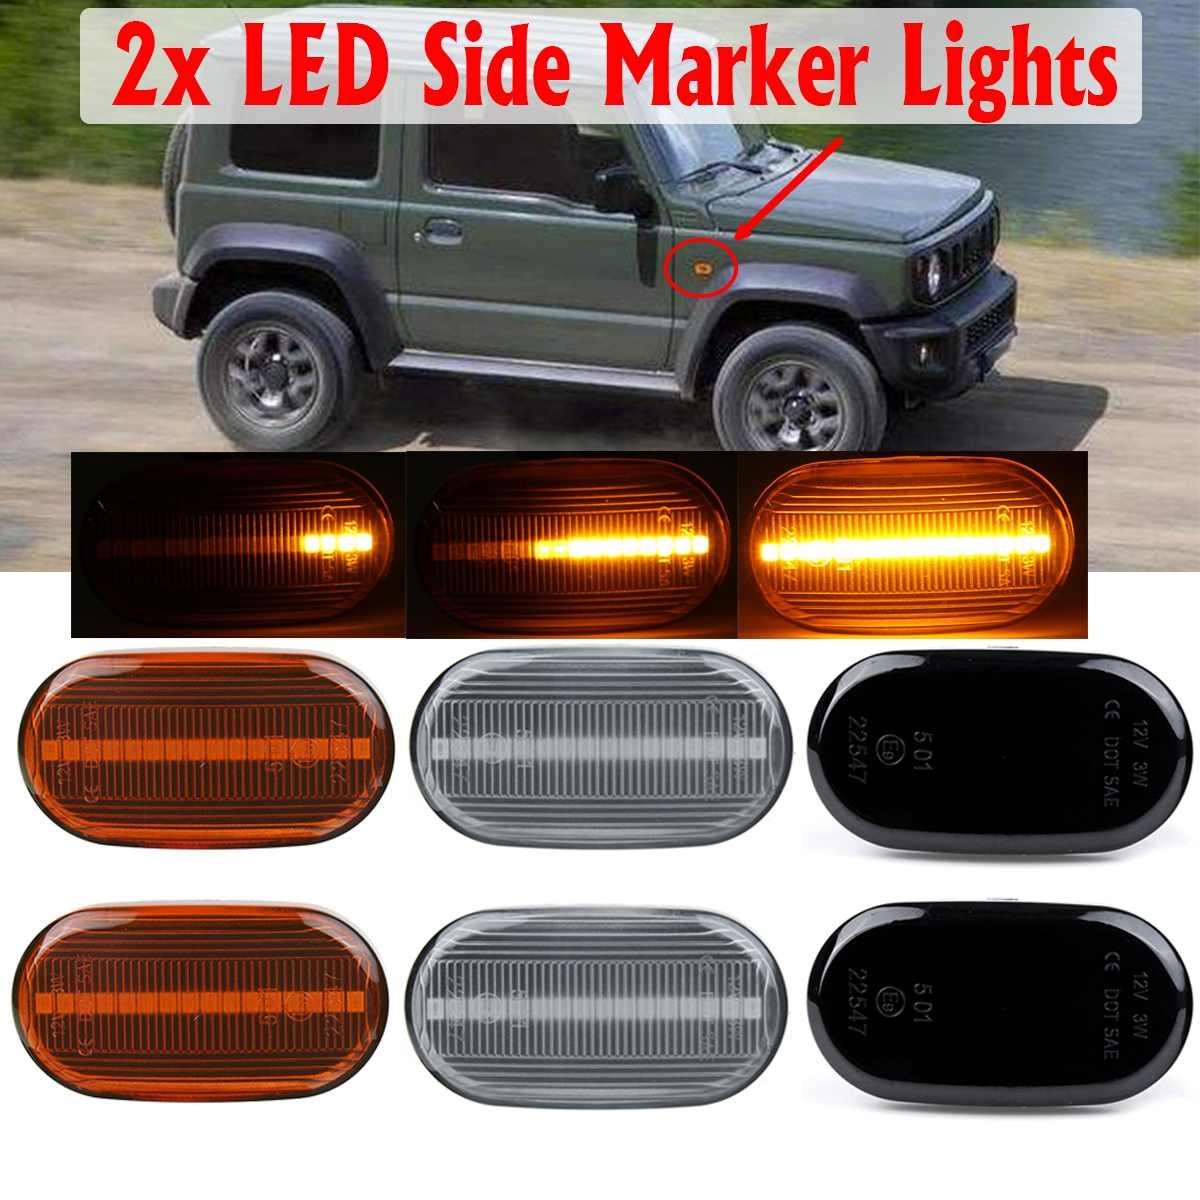 Par led marcador lateral fluindo sinal de volta lâmpada dinâmica blinker para suzuki jimny b64w jb74 jb23 jb64 para mazda spiano hf21s